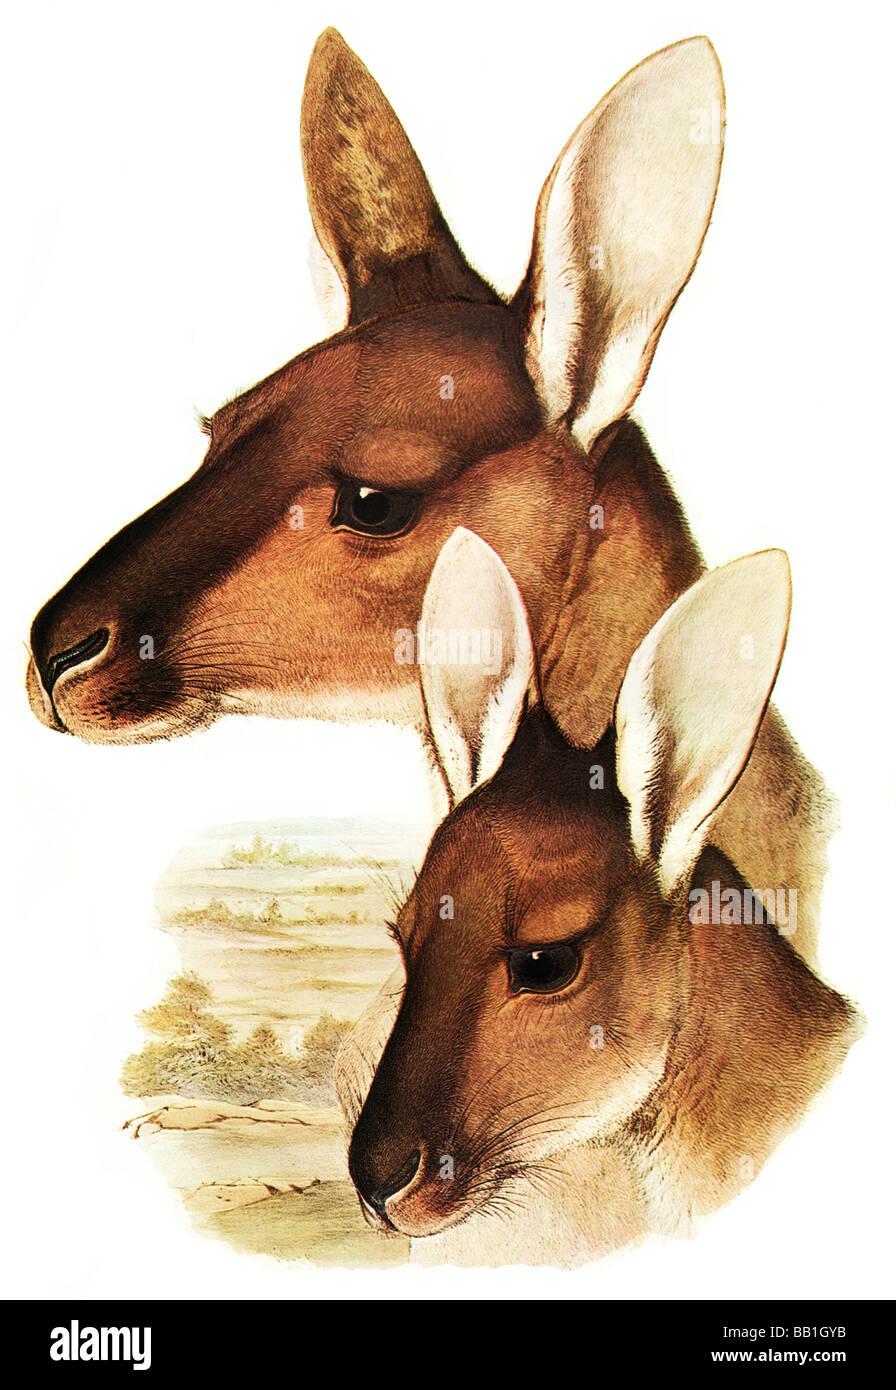 Illustration of the australian marsupial mammal The Western Grey Kangaroo, Macropus fuliginosus - Stock Image